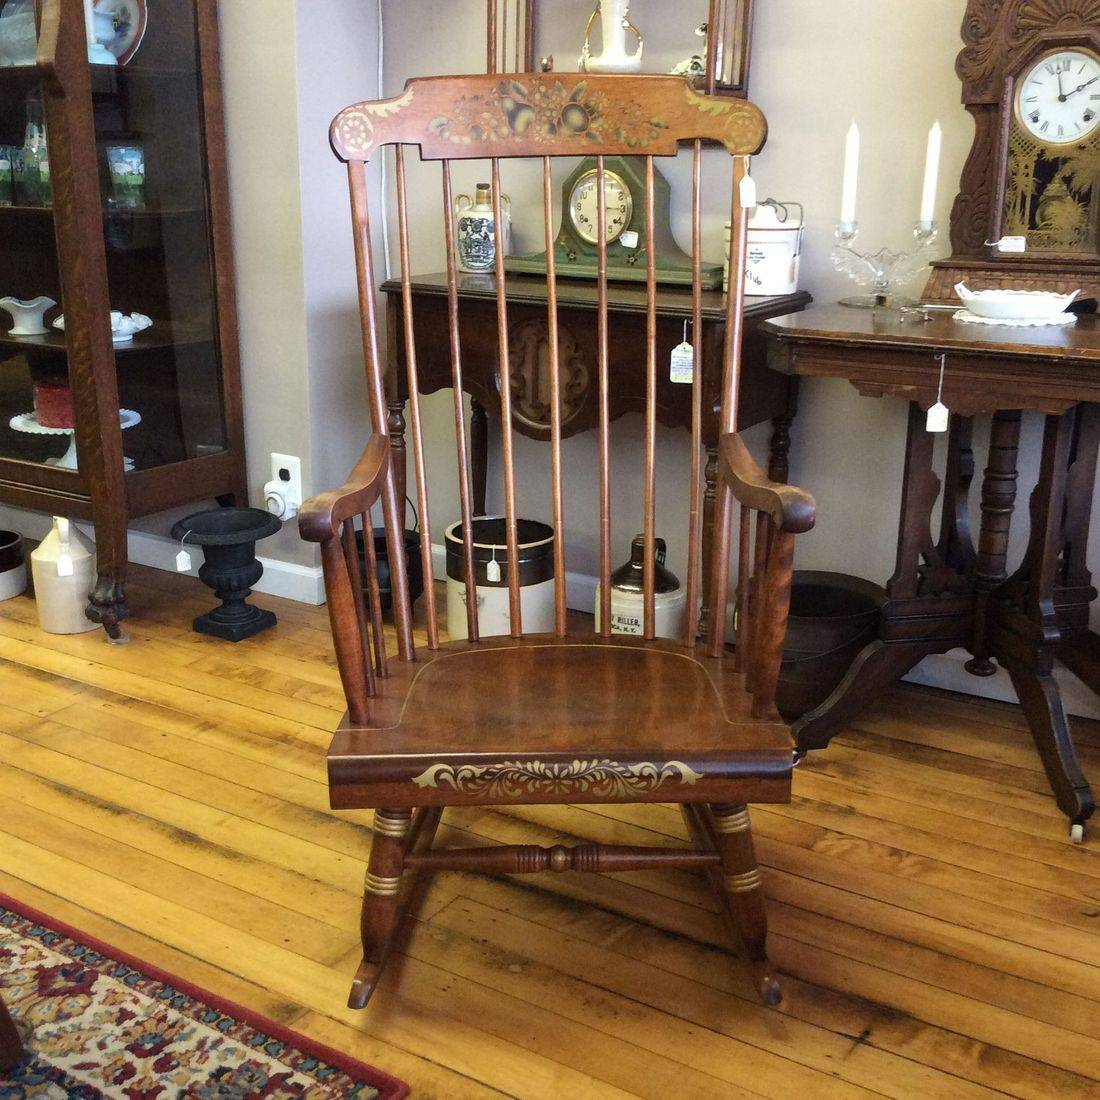 C. 1960's/70's Nichols & Stone Co. Stenciled Cherry Rocking Chair   $125.00